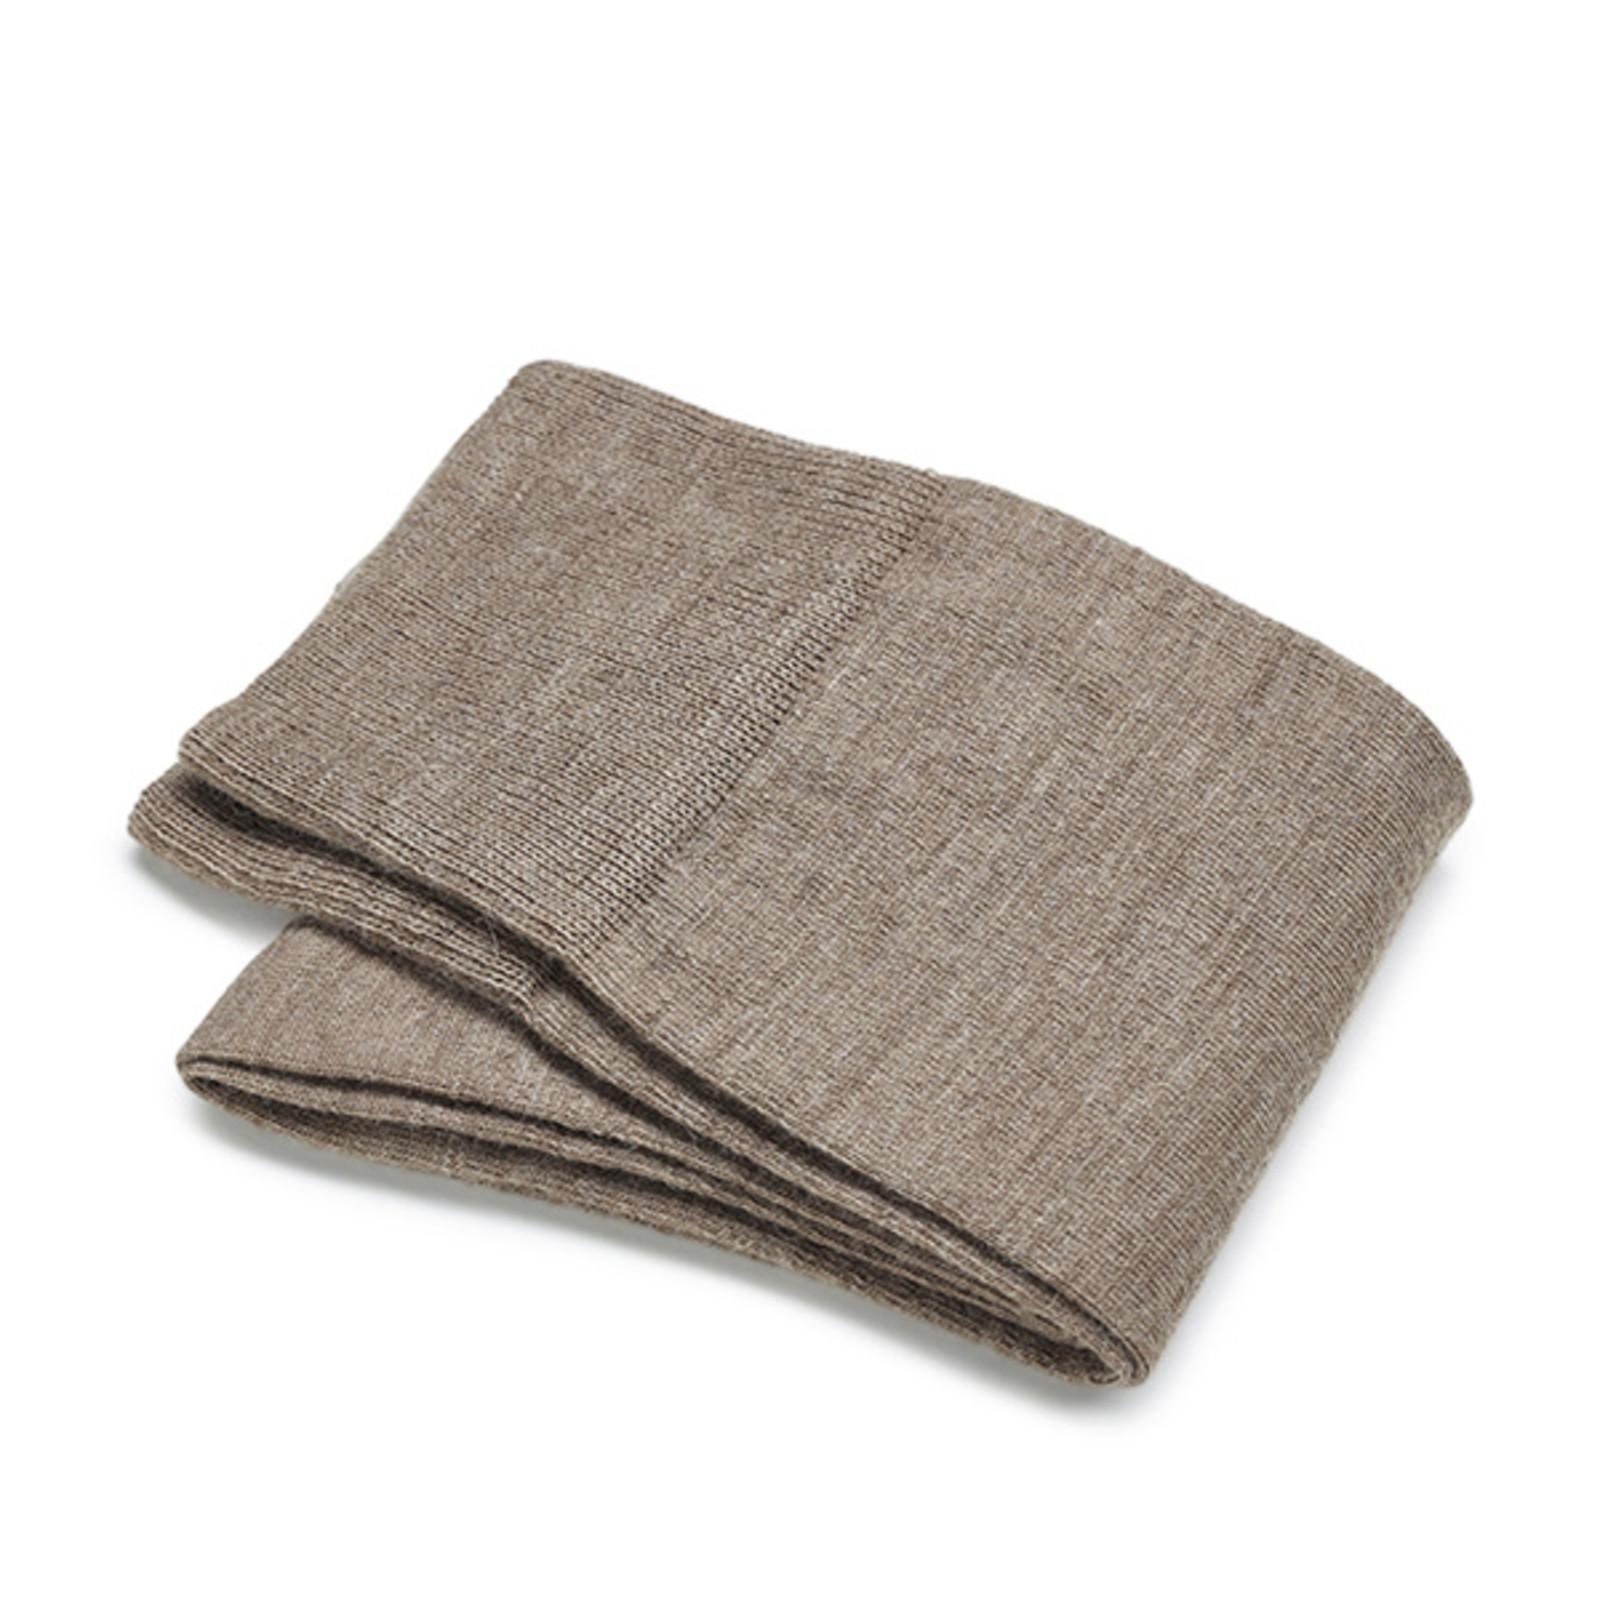 Carlo Lanza Kaki wool socks